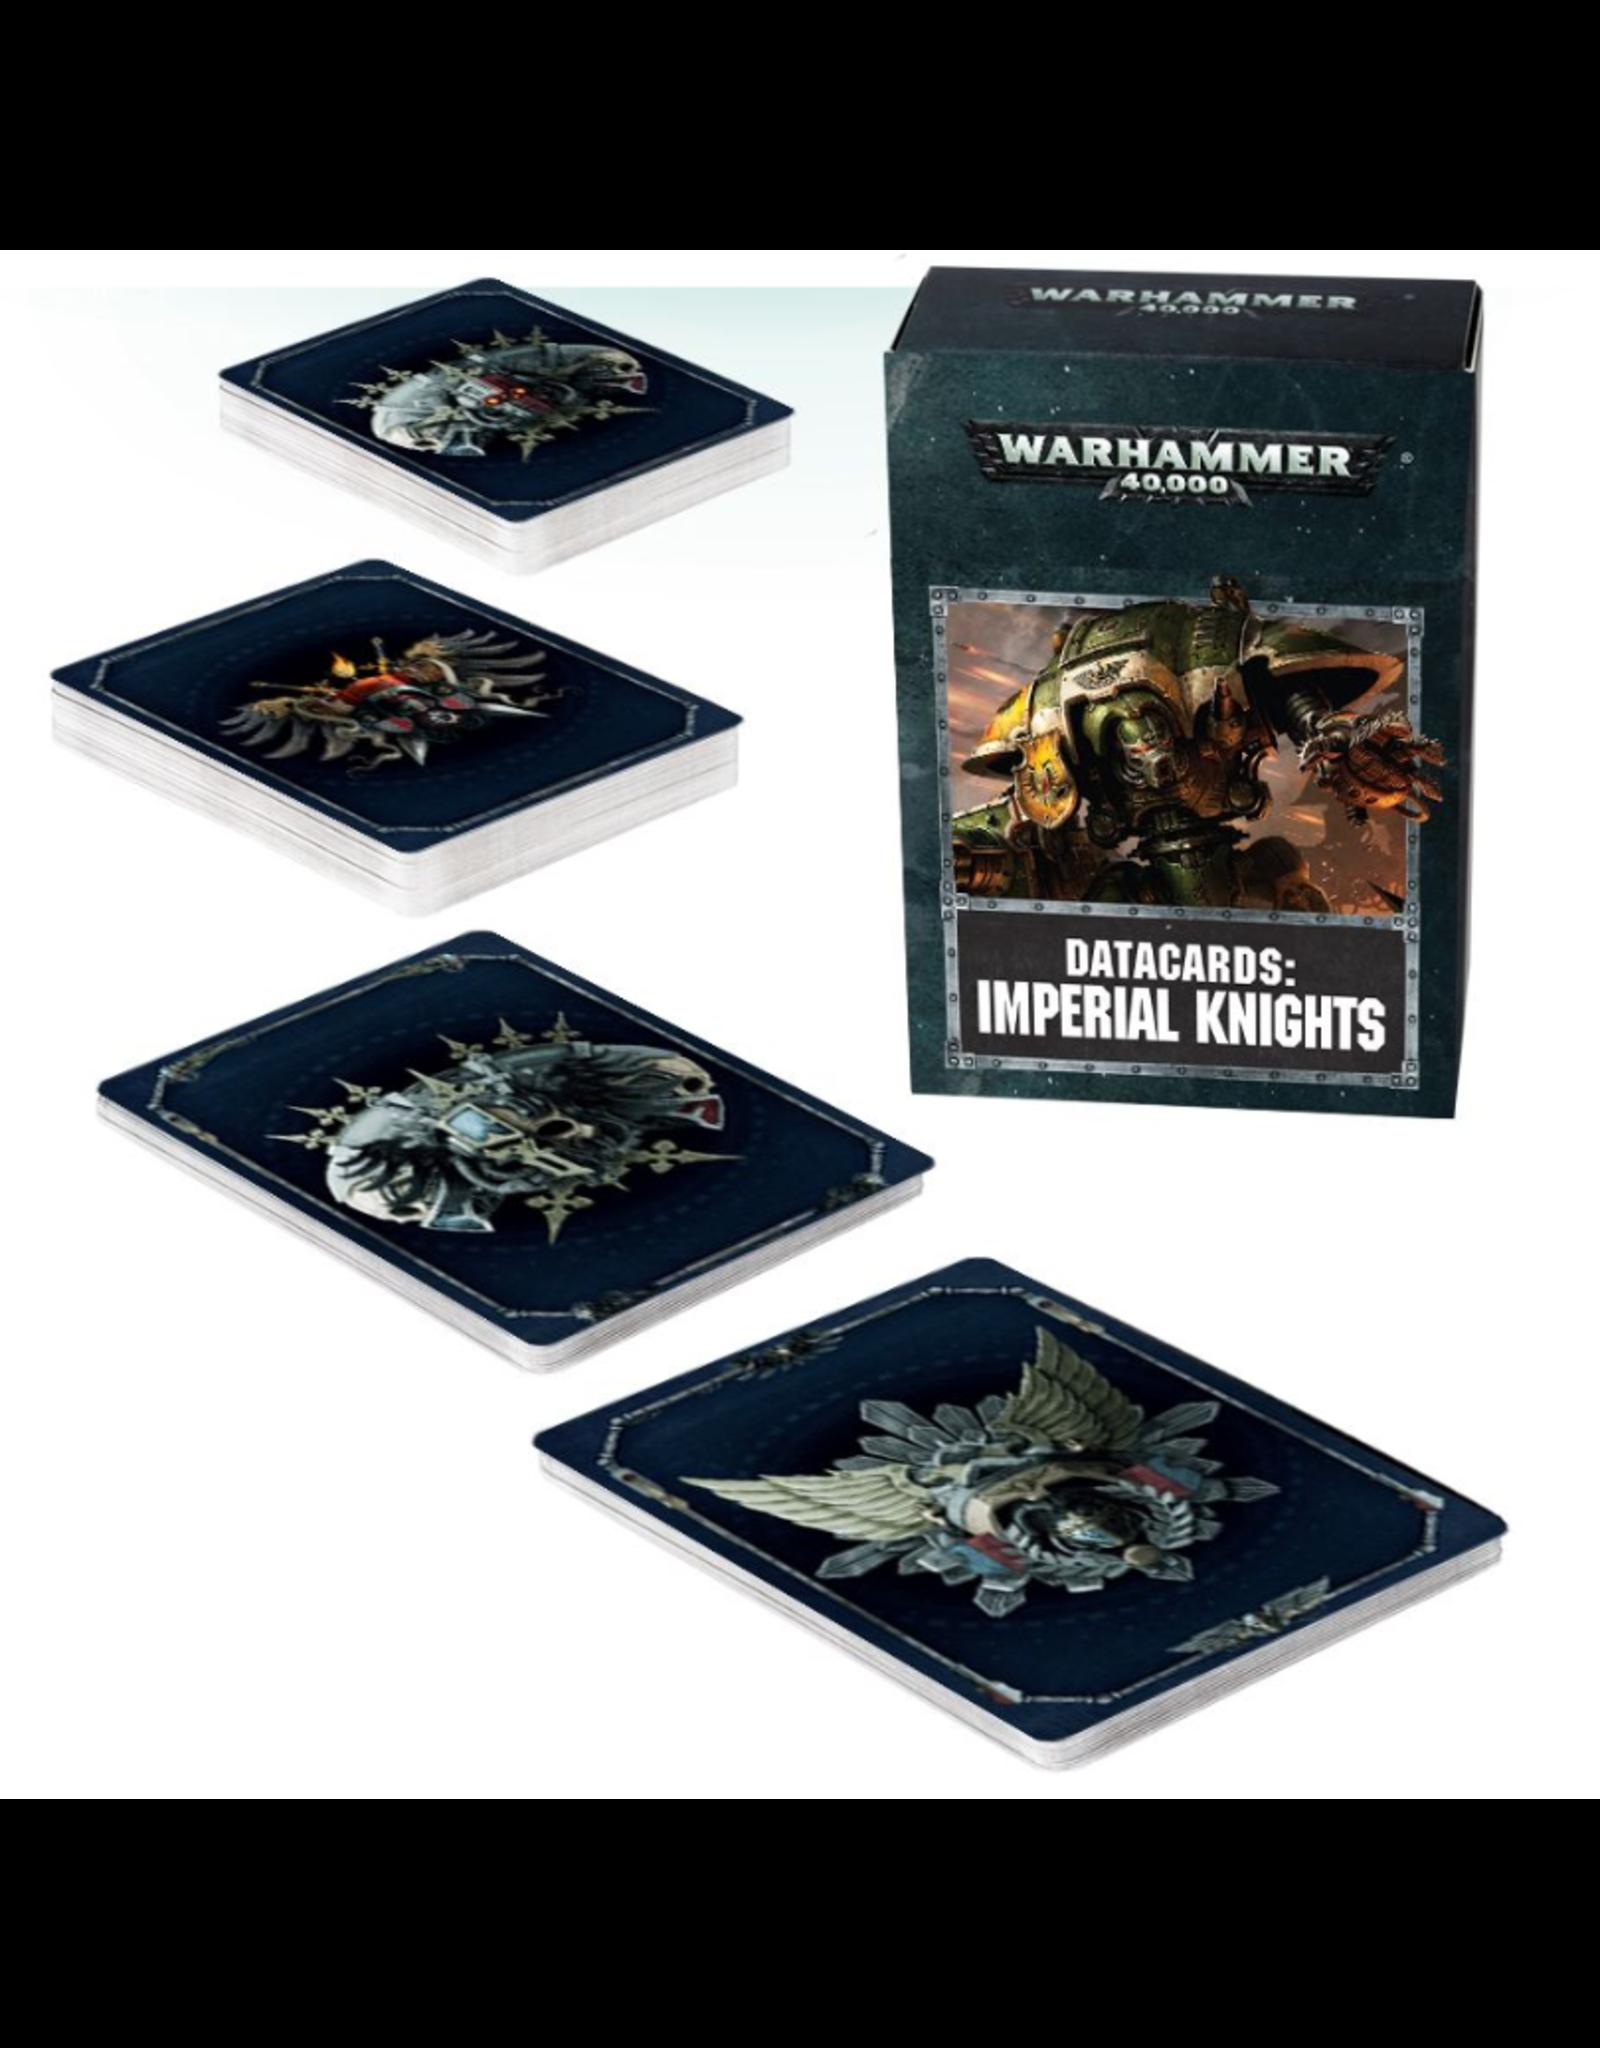 Warhammer 40K Datacards Imperial Knights